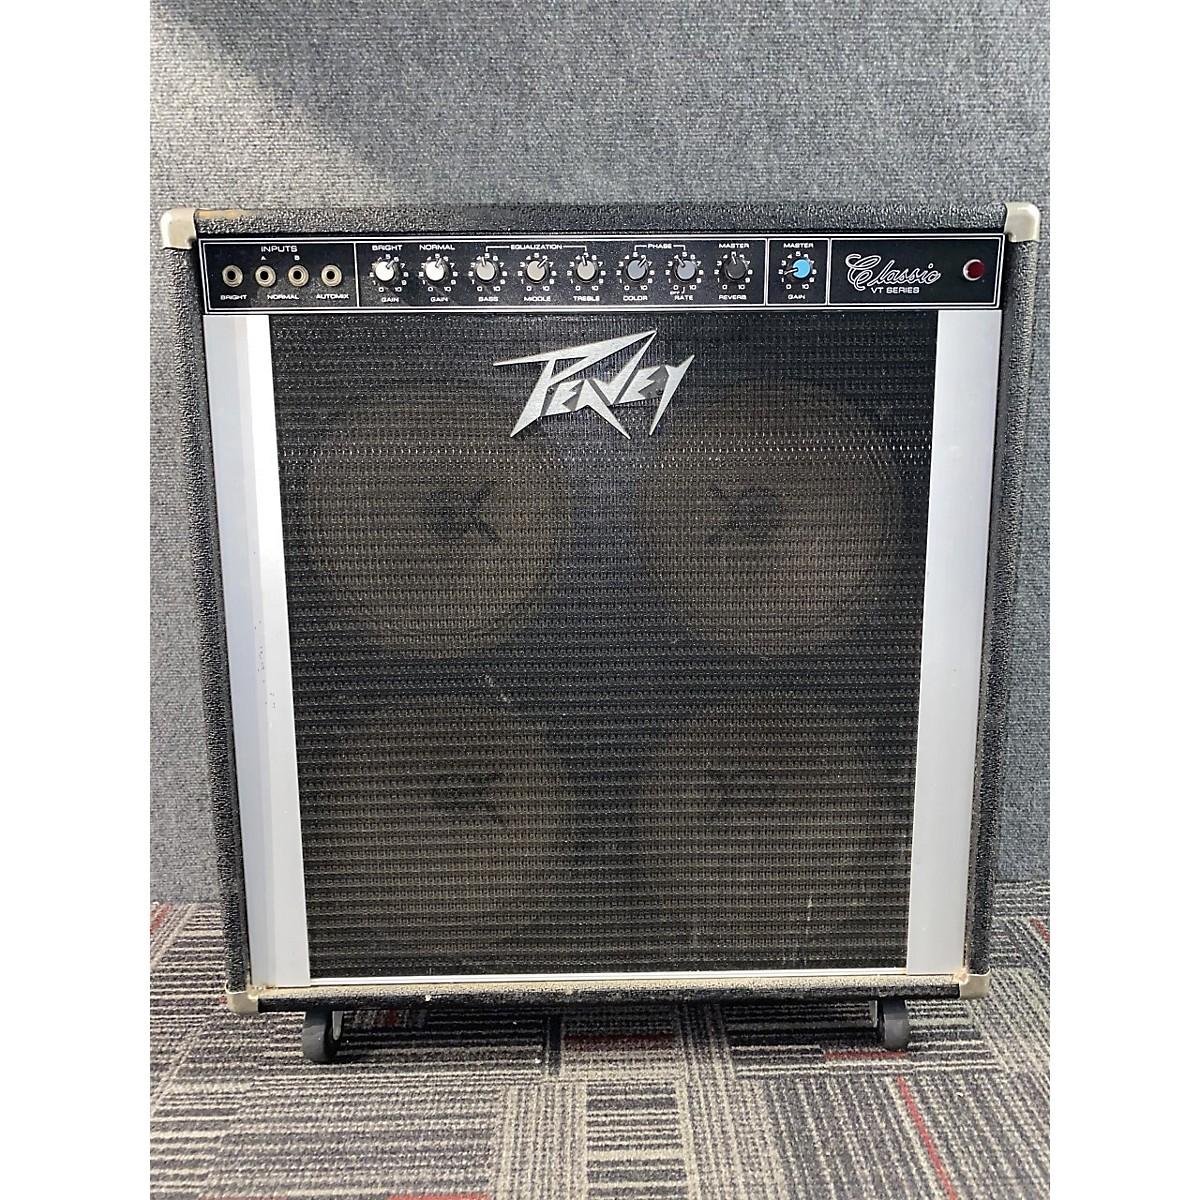 Peavey 1980 Classic 410 Tube Guitar Combo Amp